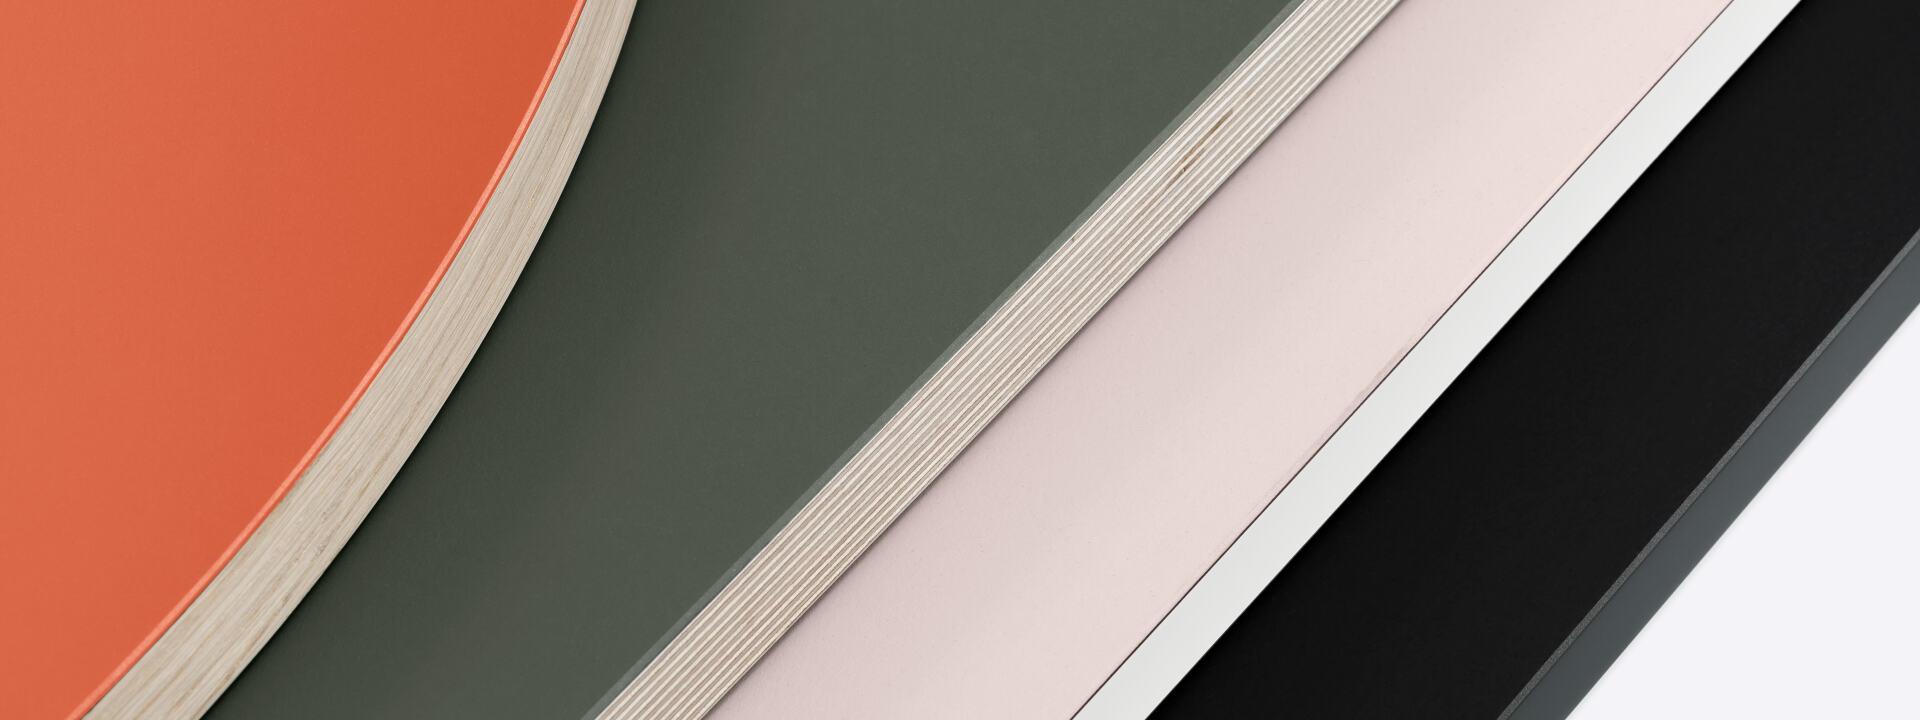 Basic Linoleum Table Top, Tabletops, Lino Table Top, Linoleum Table Top